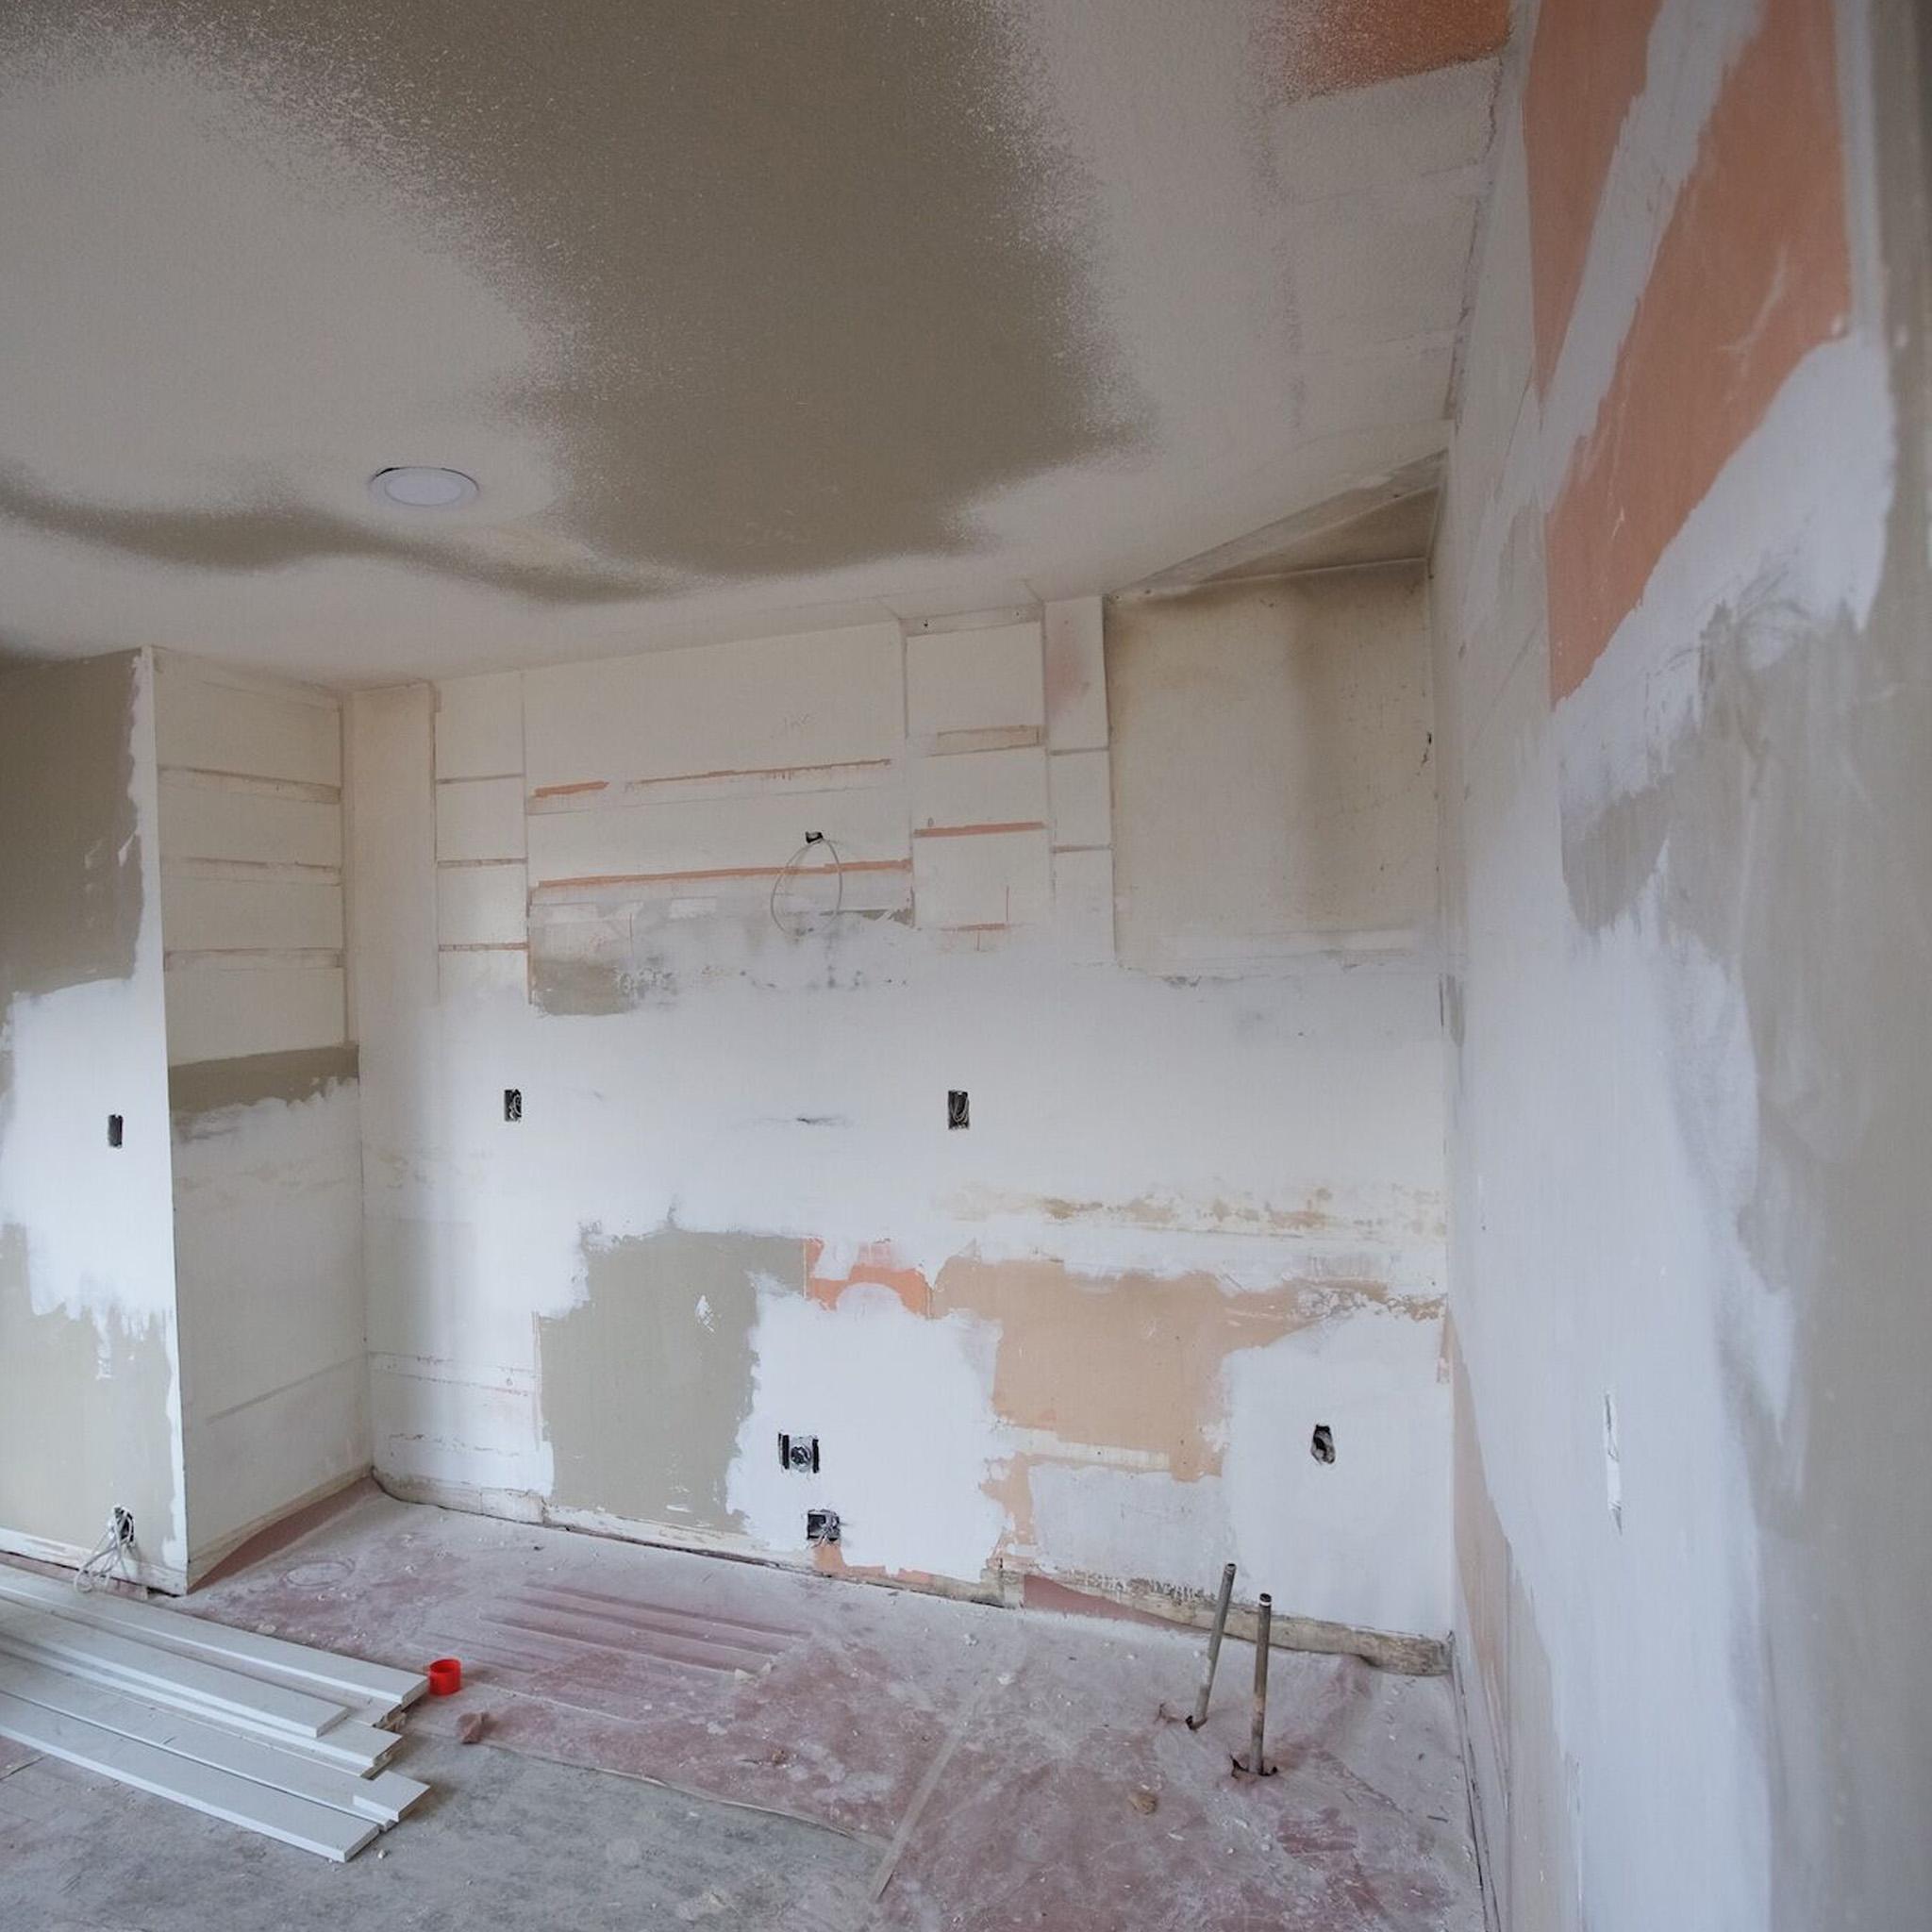 S2E04 - The Mural House_0004_Layer 40.jpg